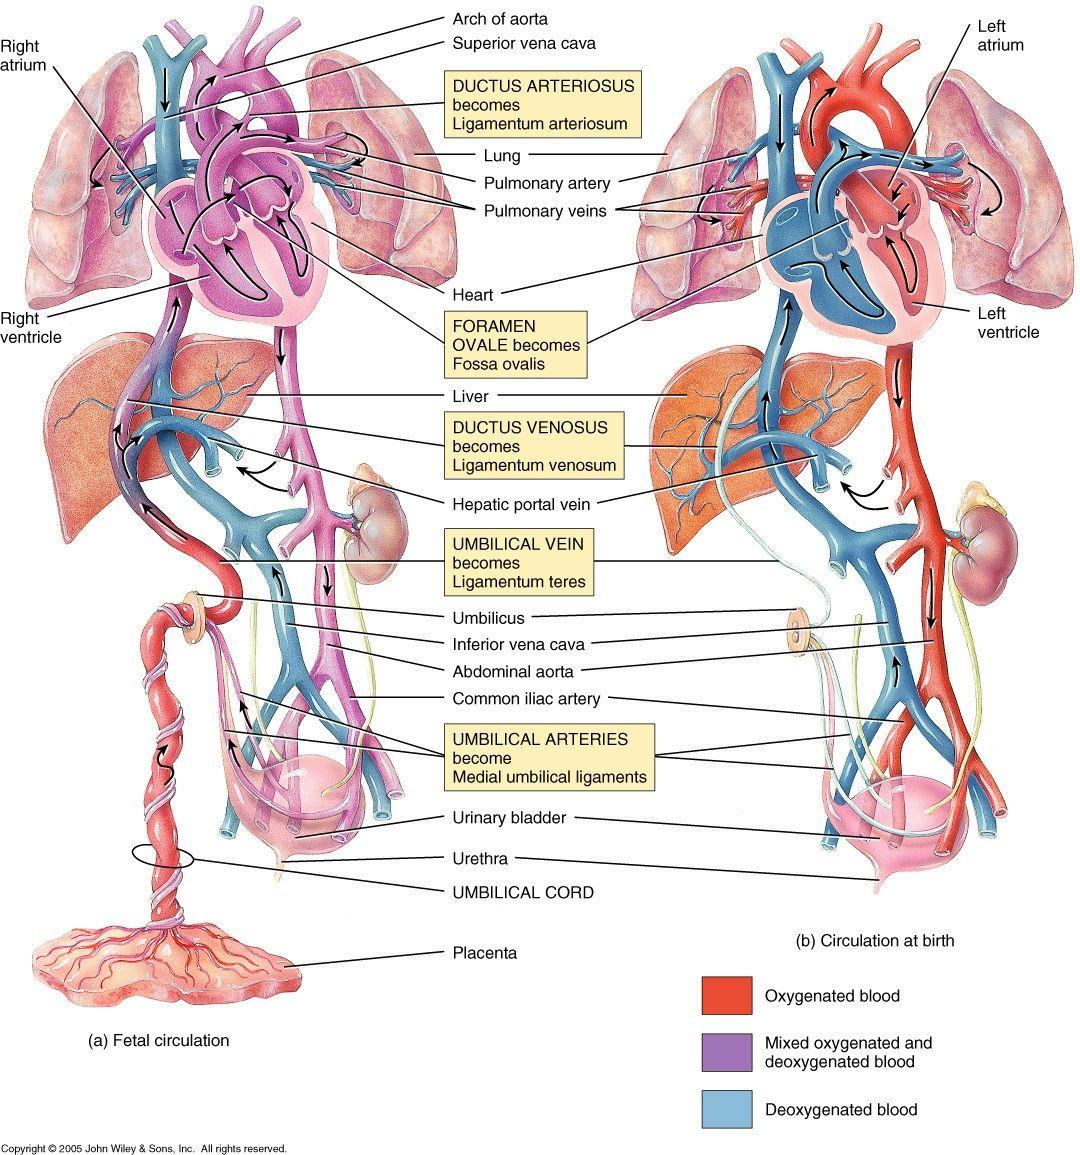 Fetal and Post-Natal/Adult Circulation in Juxtaposition | Nurse ...